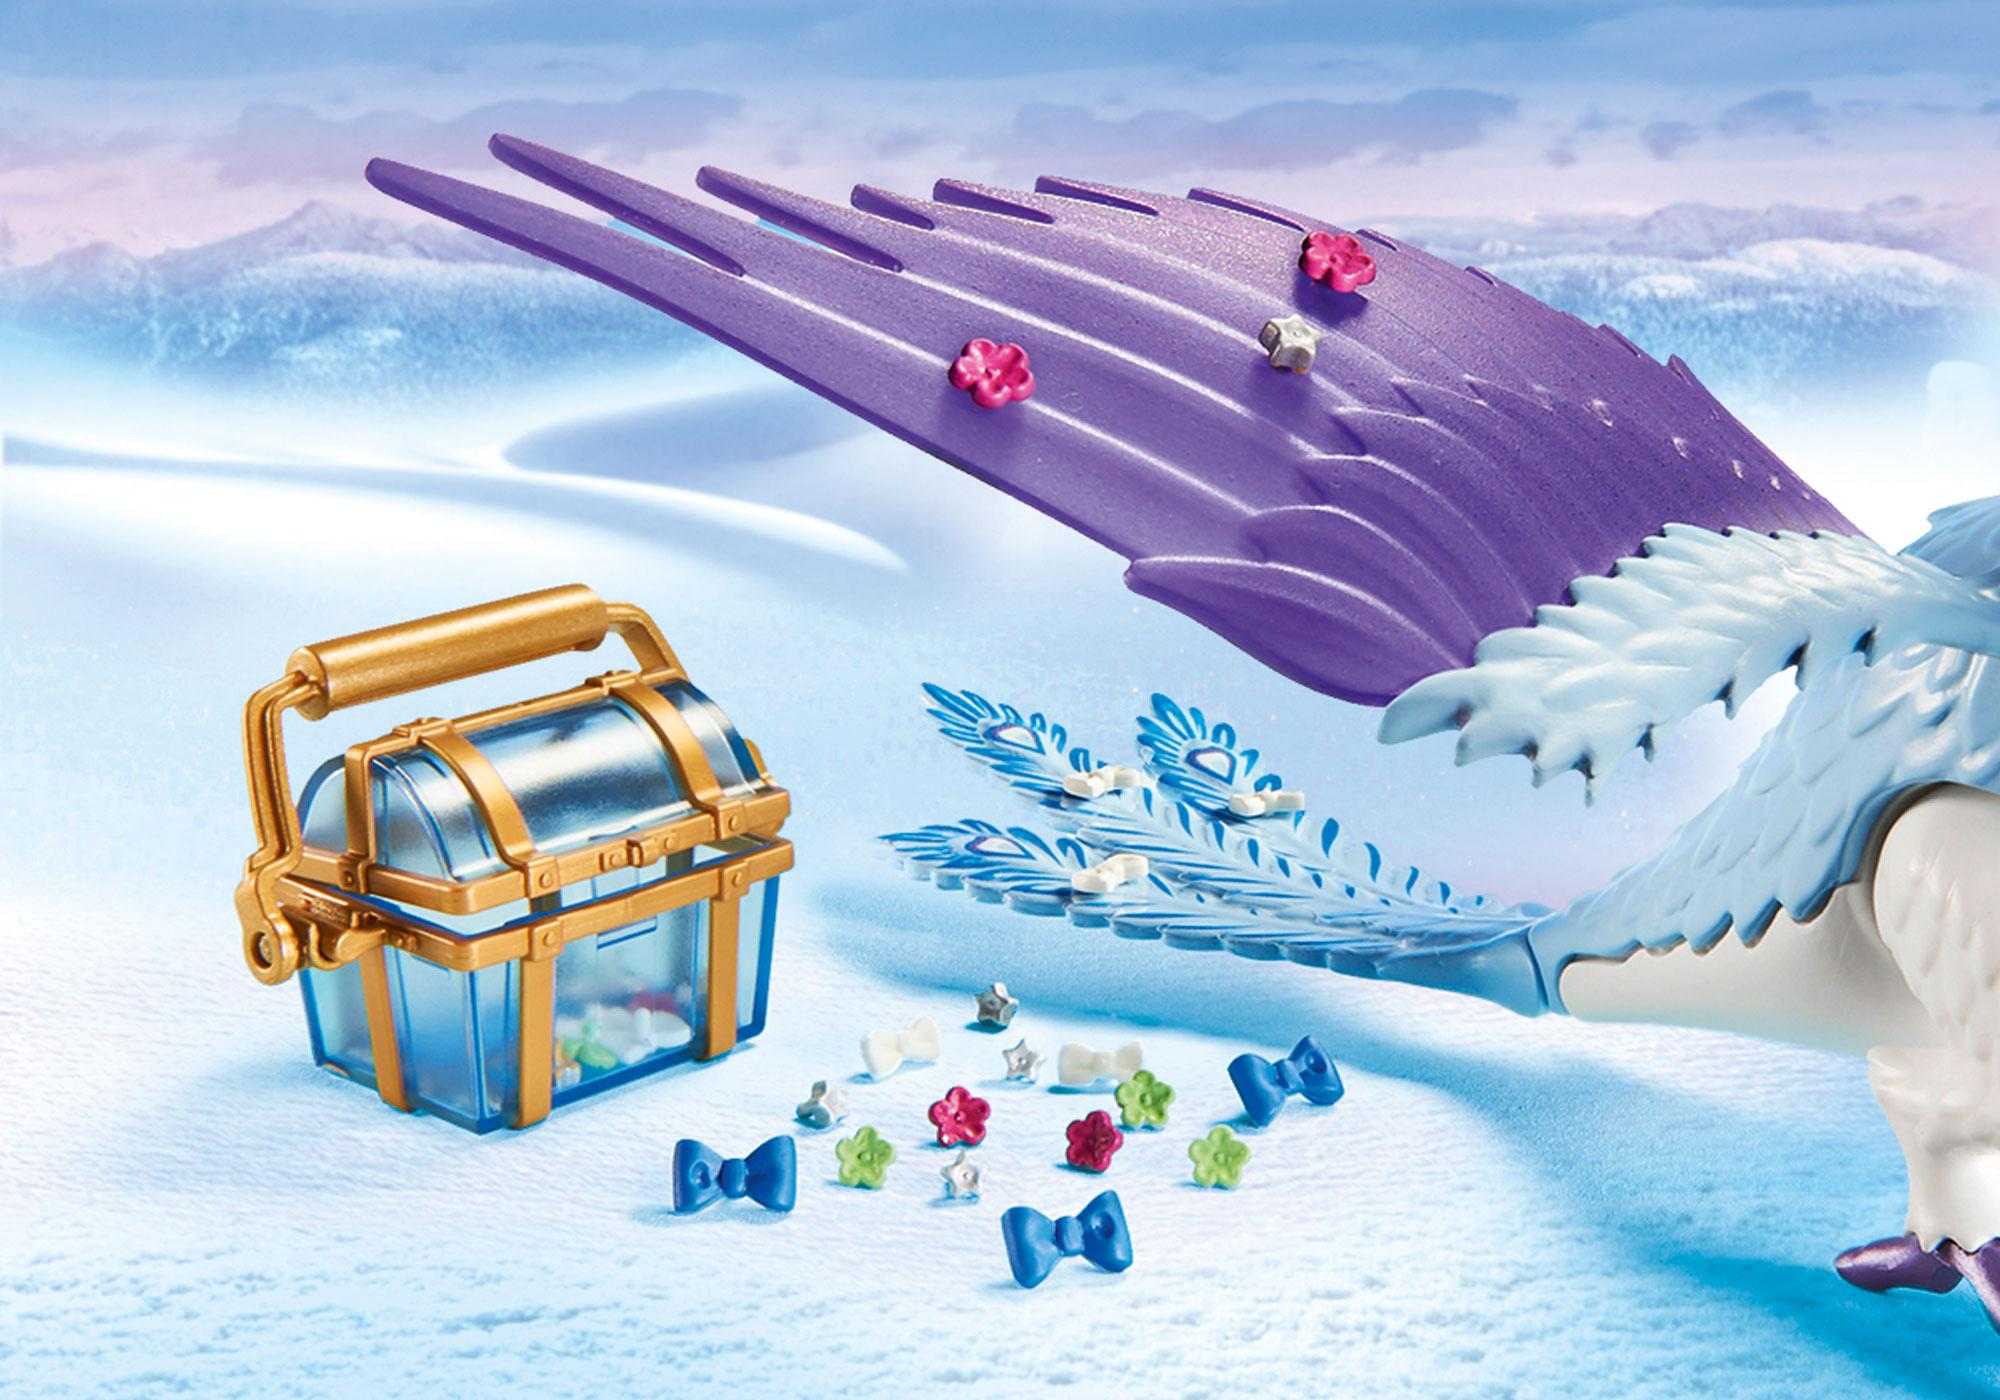 http://media.playmobil.com/i/playmobil/9472_product_extra2/Gardienne et Phénix royal